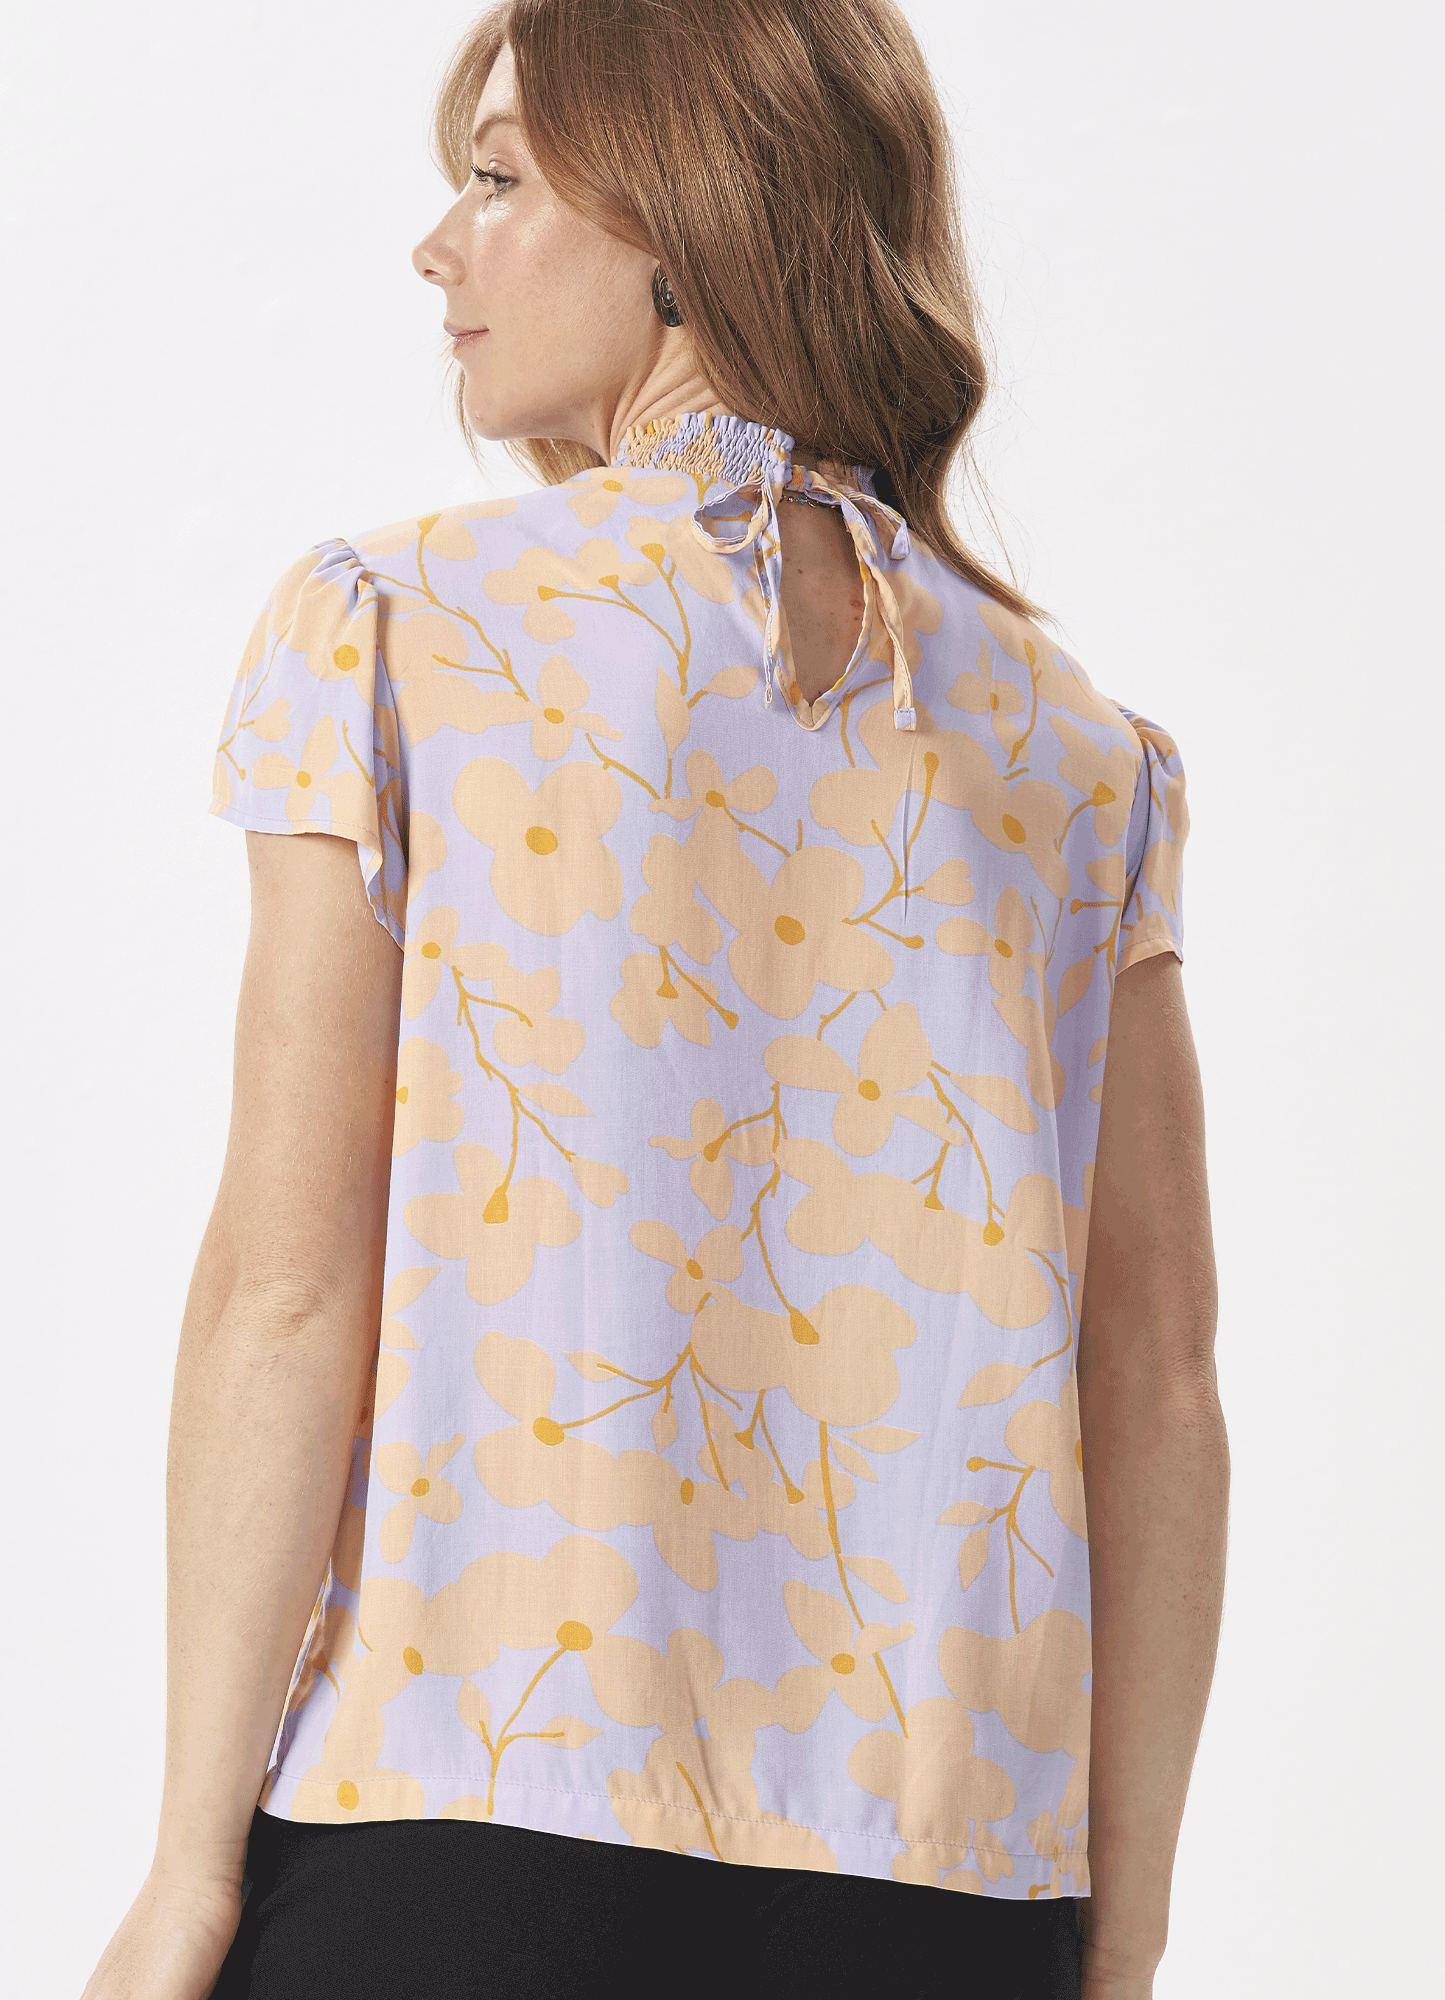 Blusa Feminina Plus Size Tecido Estampada Detalhe Lastex Decote